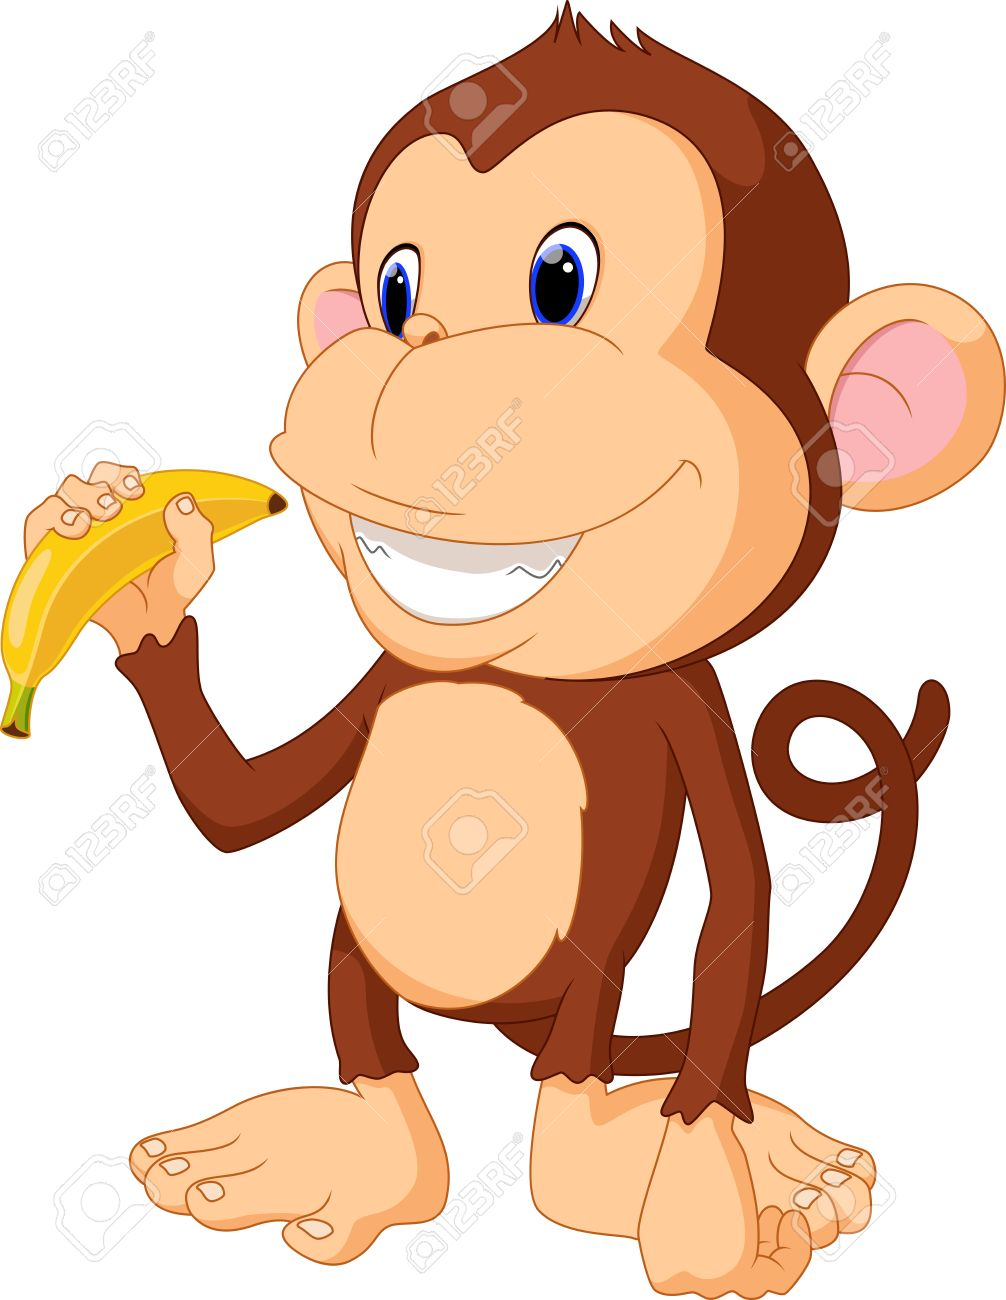 Illustration of funny Monkey eat banana.